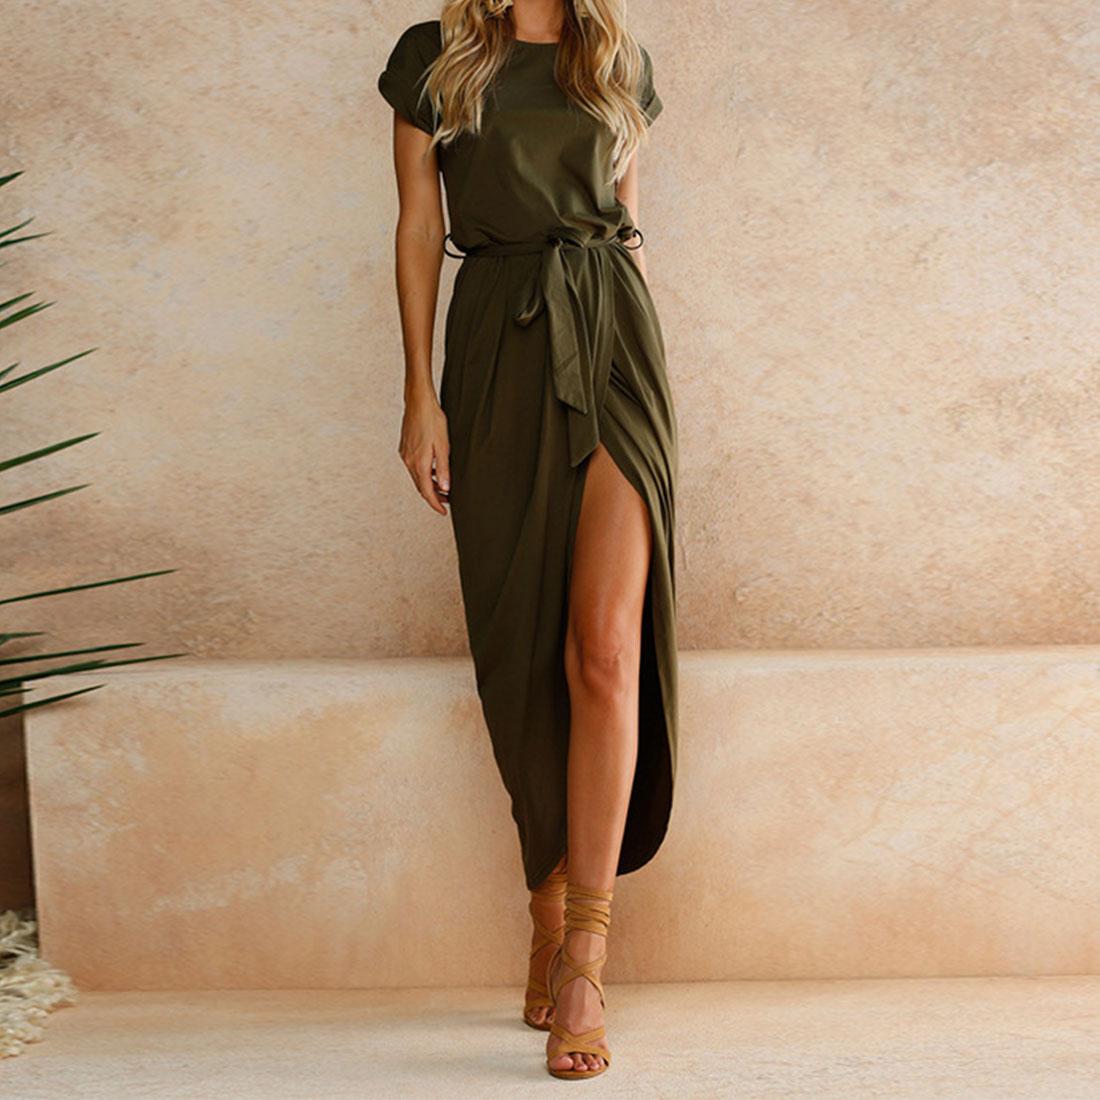 Charming Woman Tunic Irregular Bage Party Dress Short Sleeve Crew Neck Cotton Straight High Split Maxi Dress